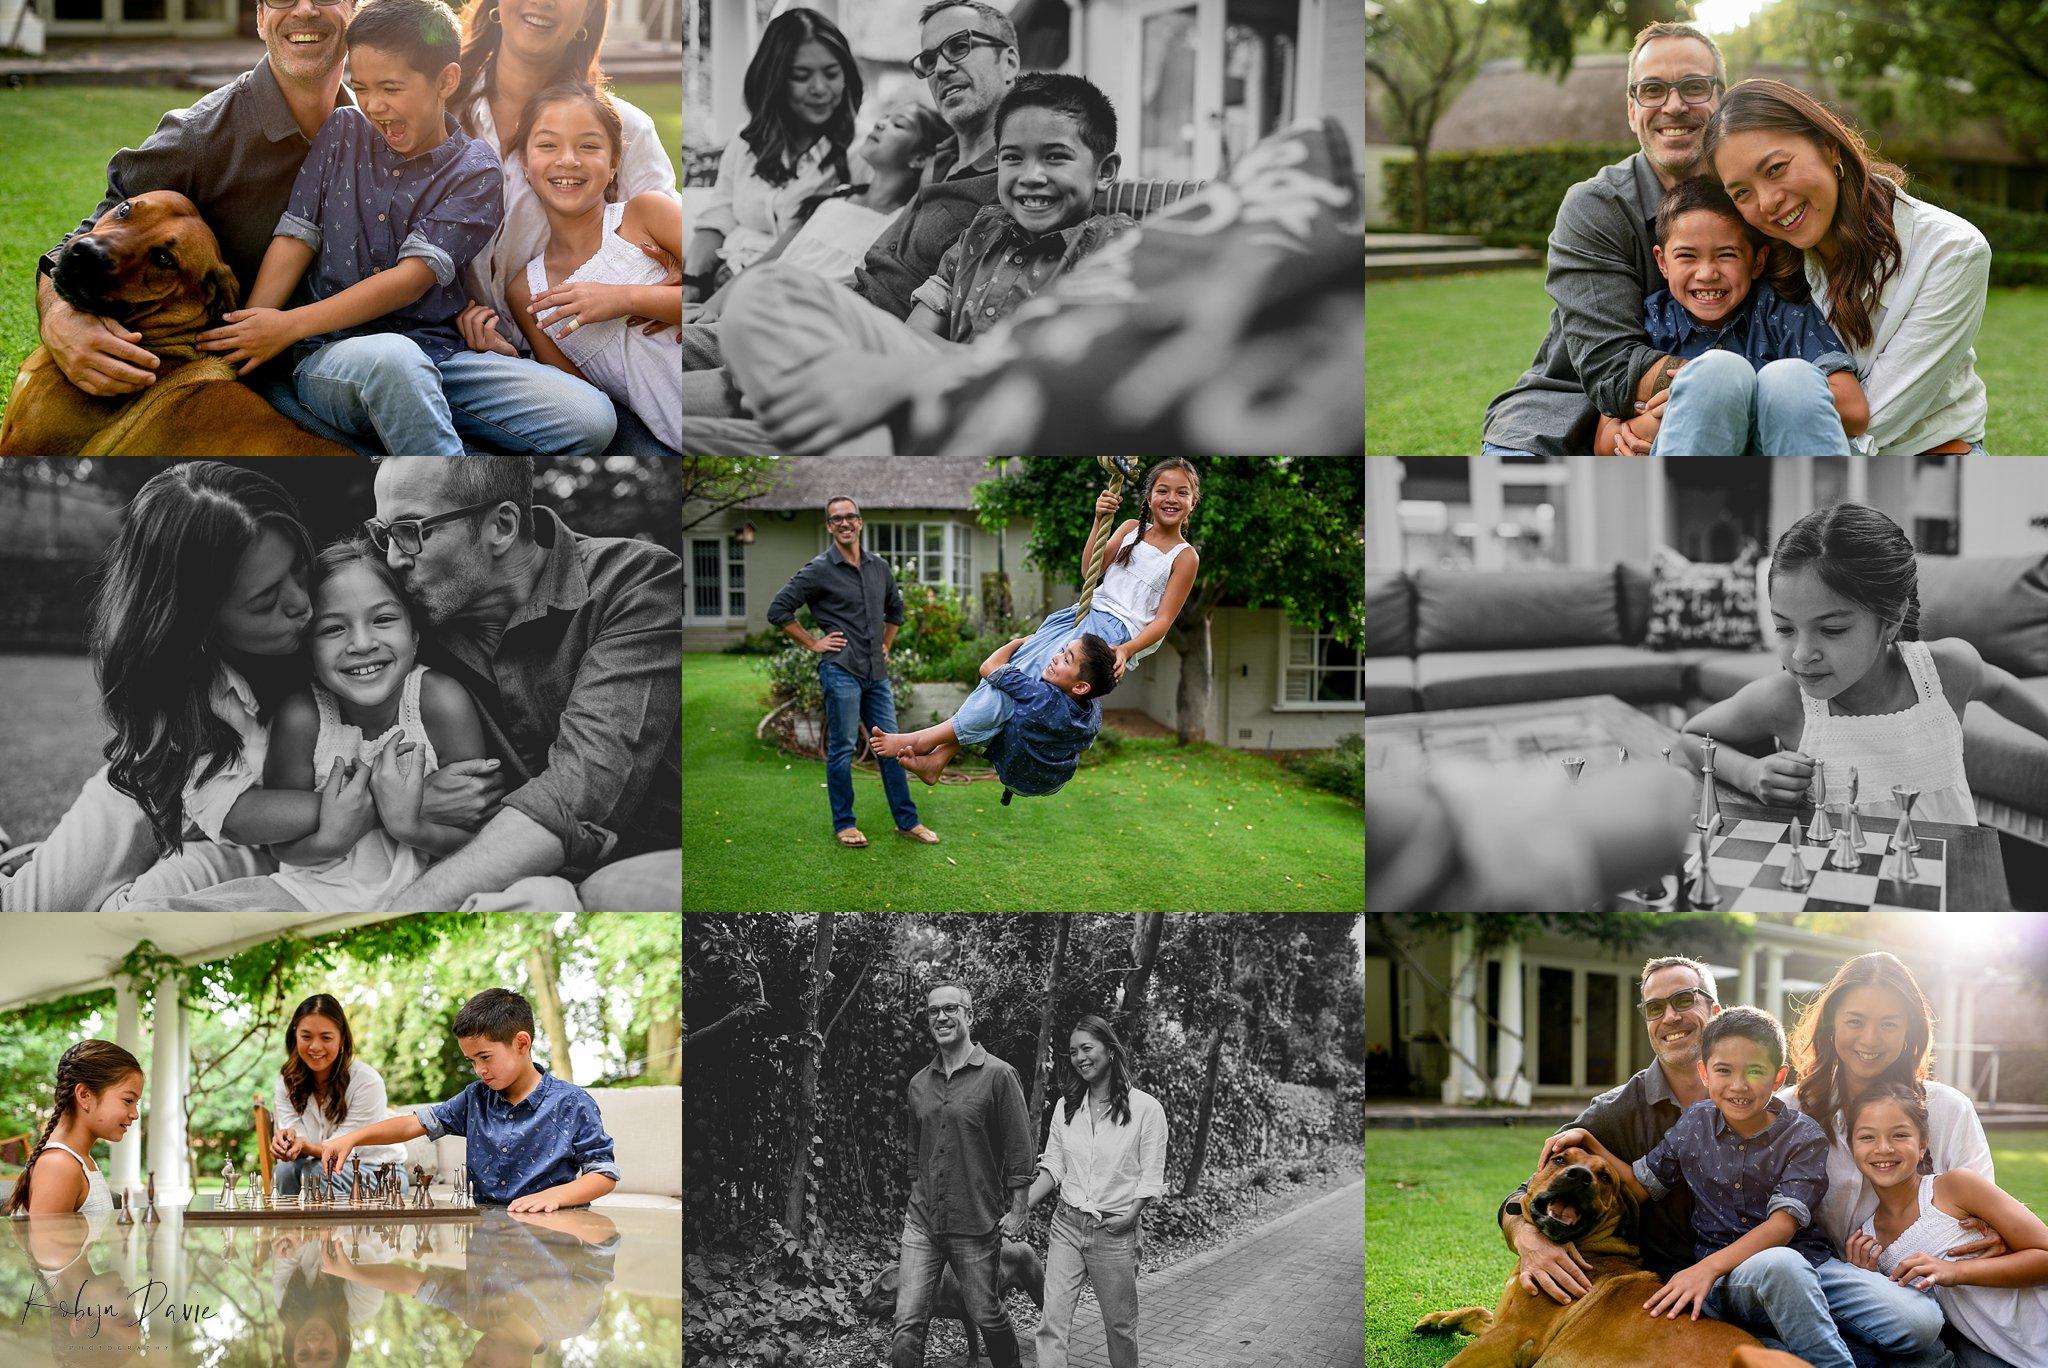 RobynDaviePhotography-JEANNIEH-3_lowres.